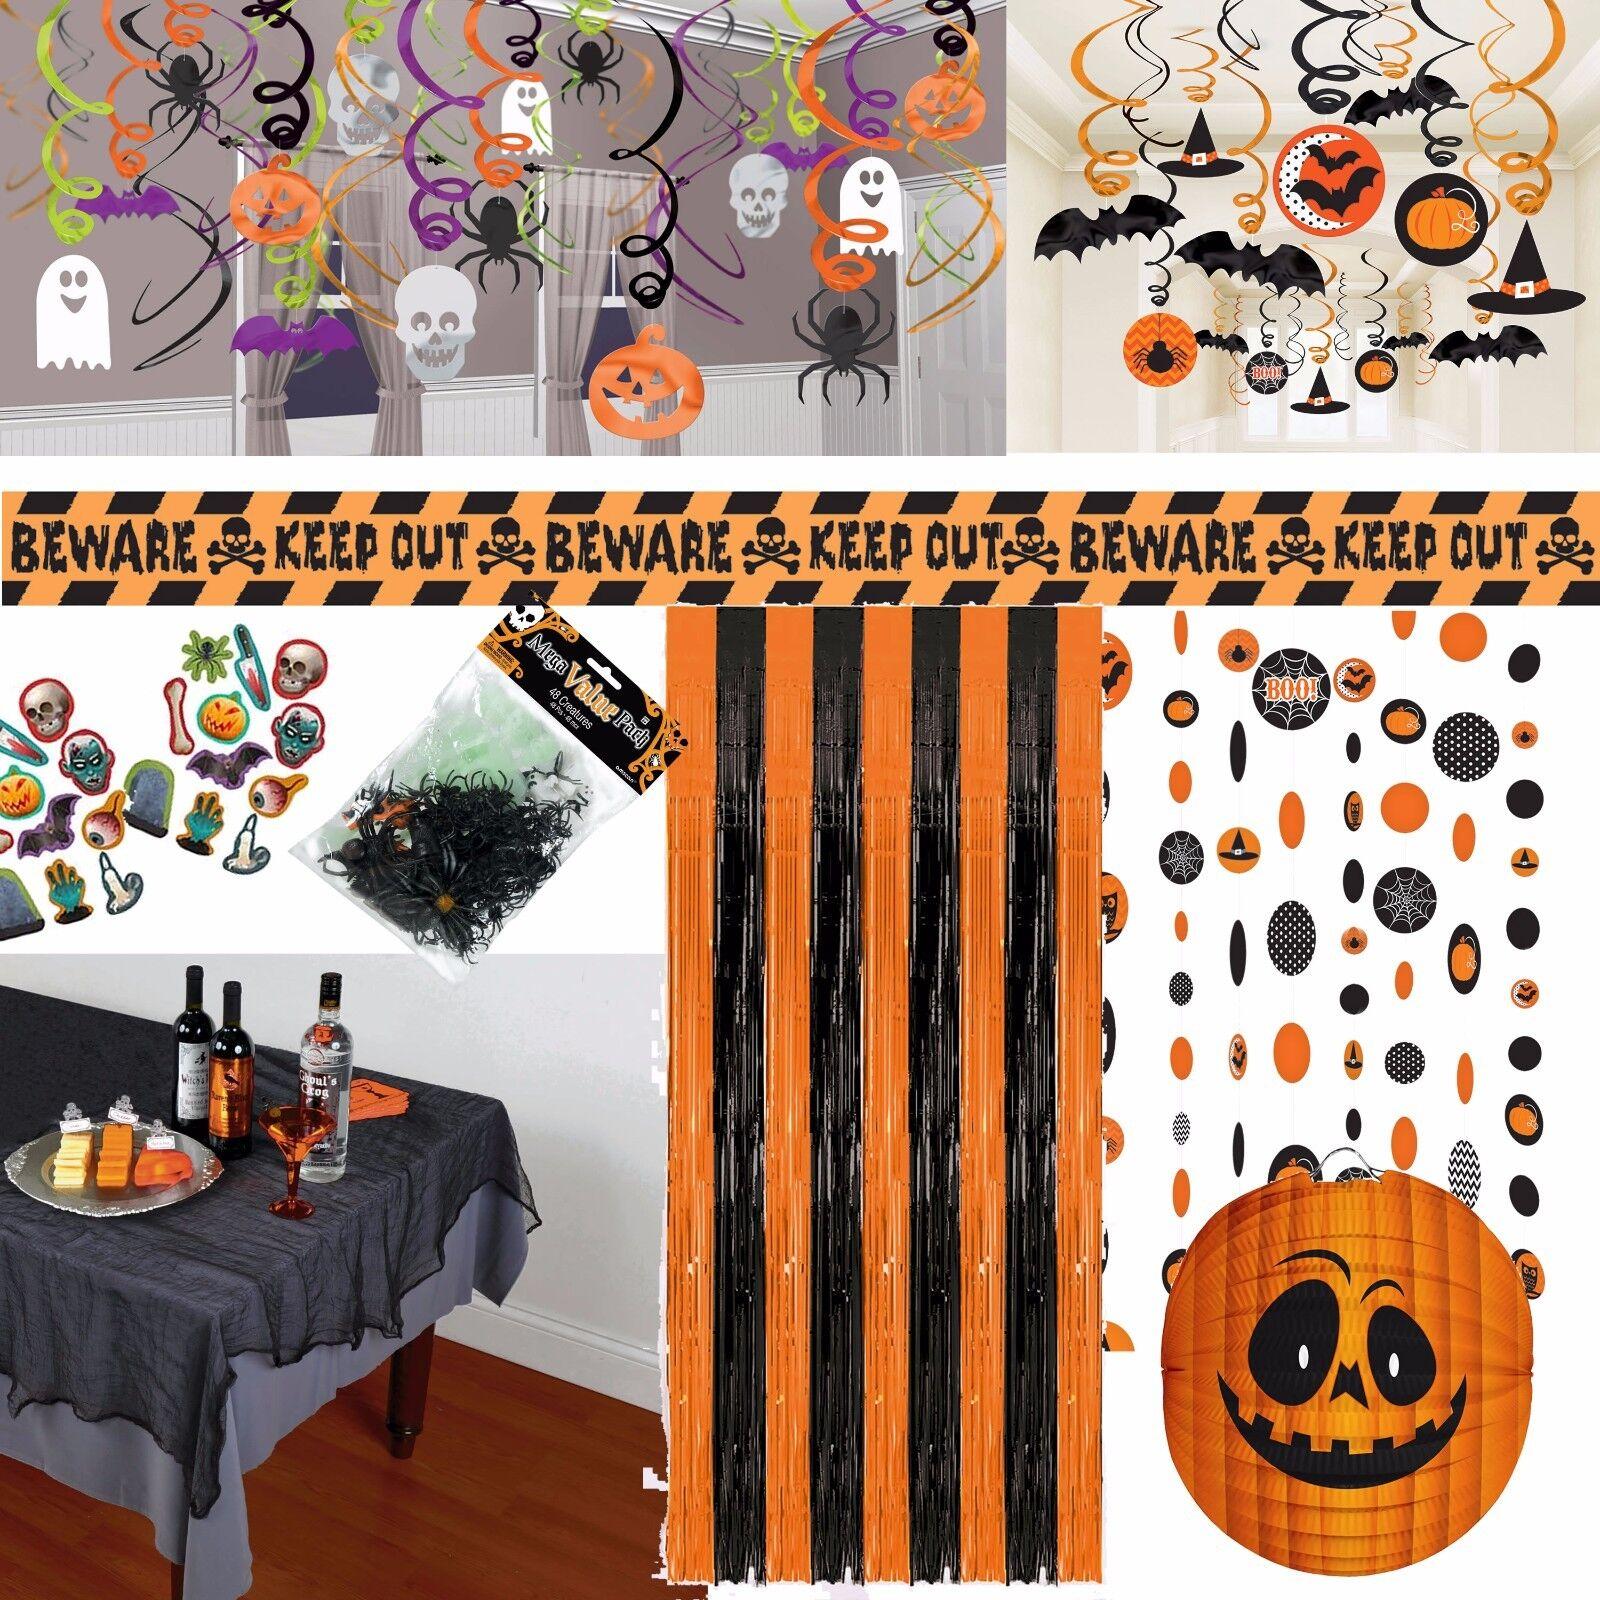 LUSTIGER KÜRBIS GRUSEL - Deko Tischdeko Horrordeko Halloween Horror Party Kinder